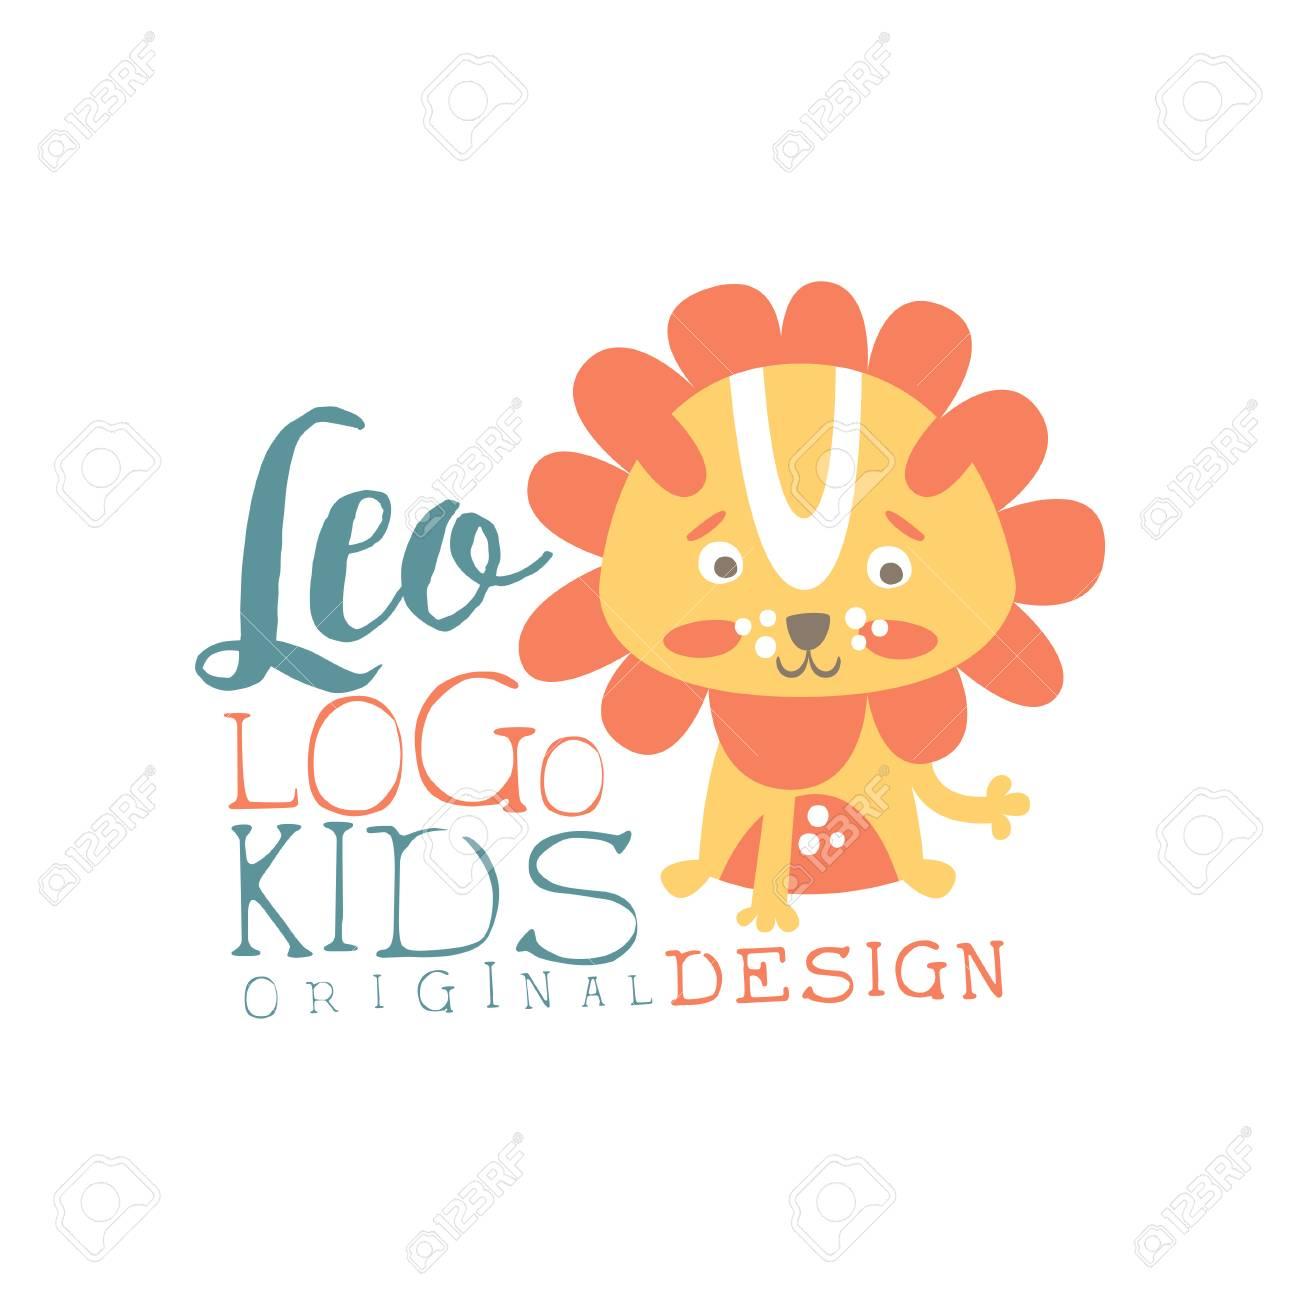 Leo kids logo original design, baby shop label, fashion print for kids wear,